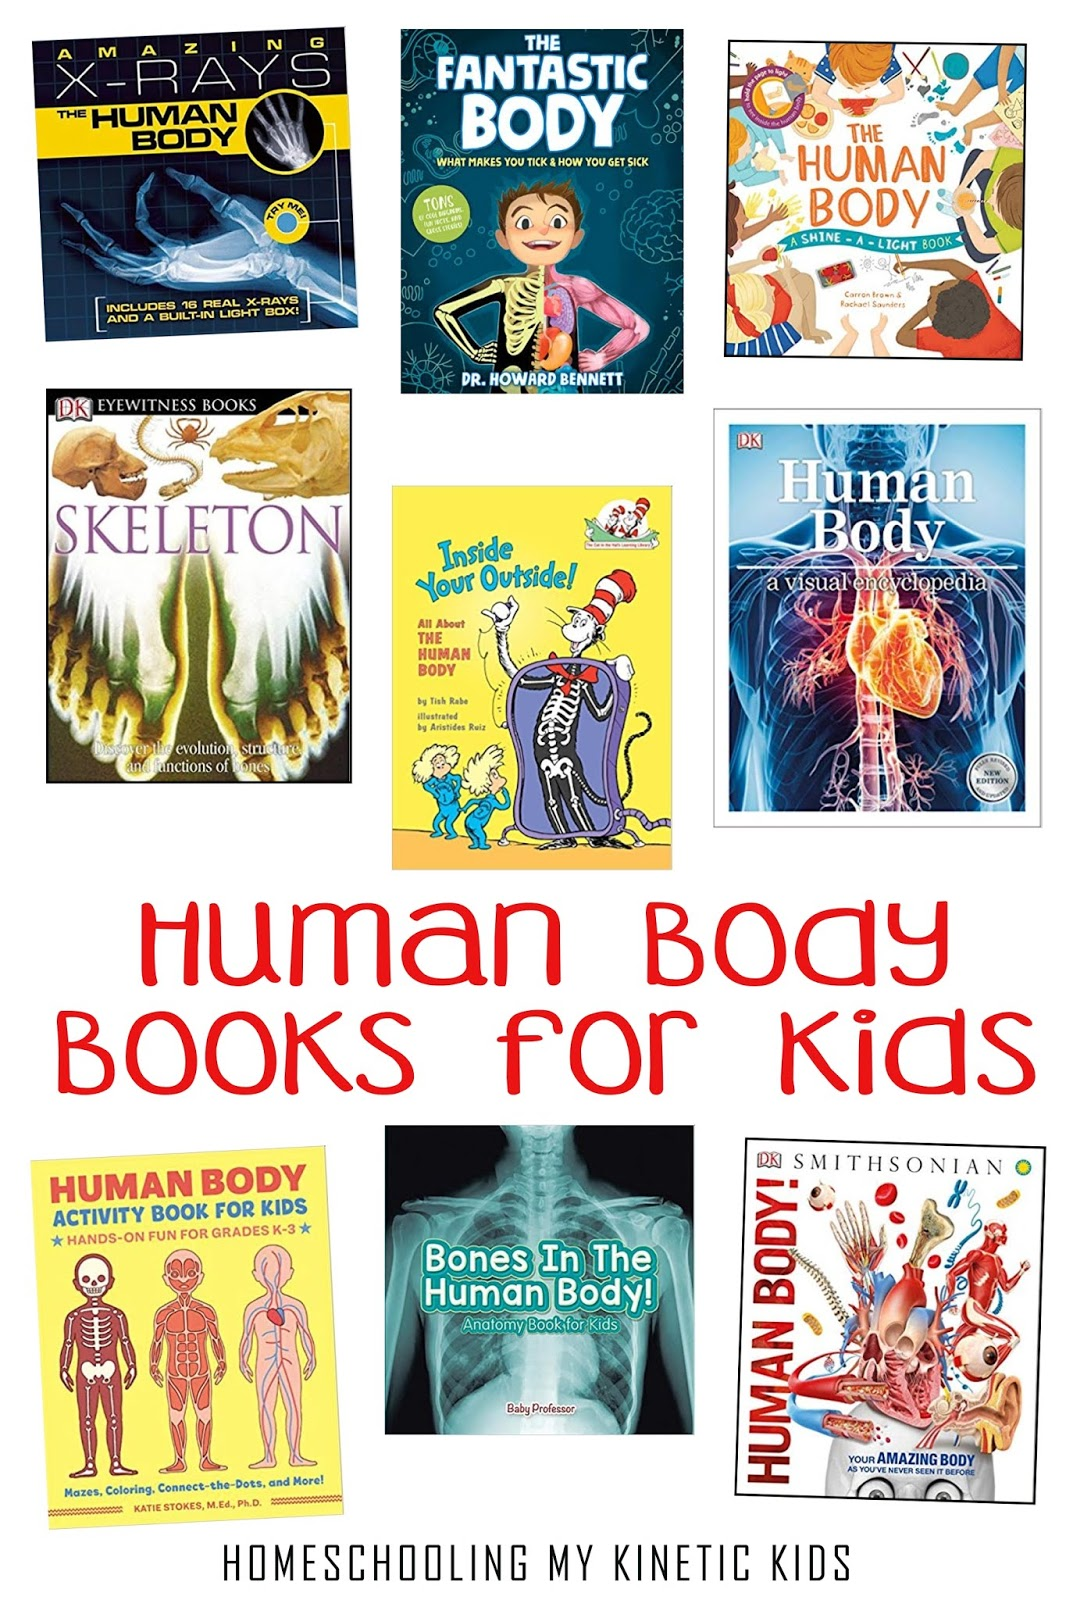 The Human Body Stuff For Kids